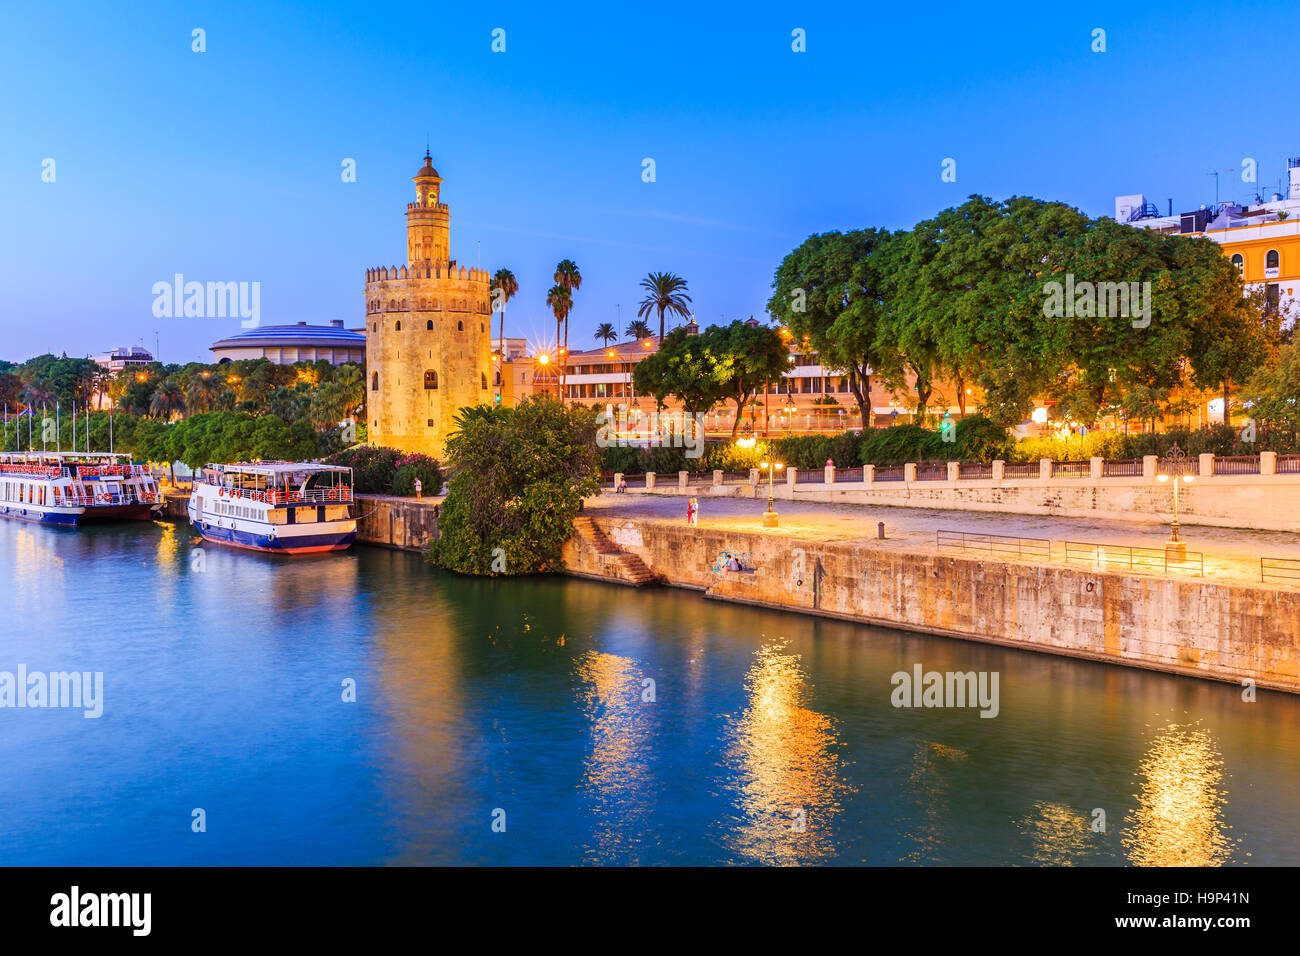 Sevilla, Spanien. Guadalquivir und goldenen Turm (Torre del Oro) Stockbild